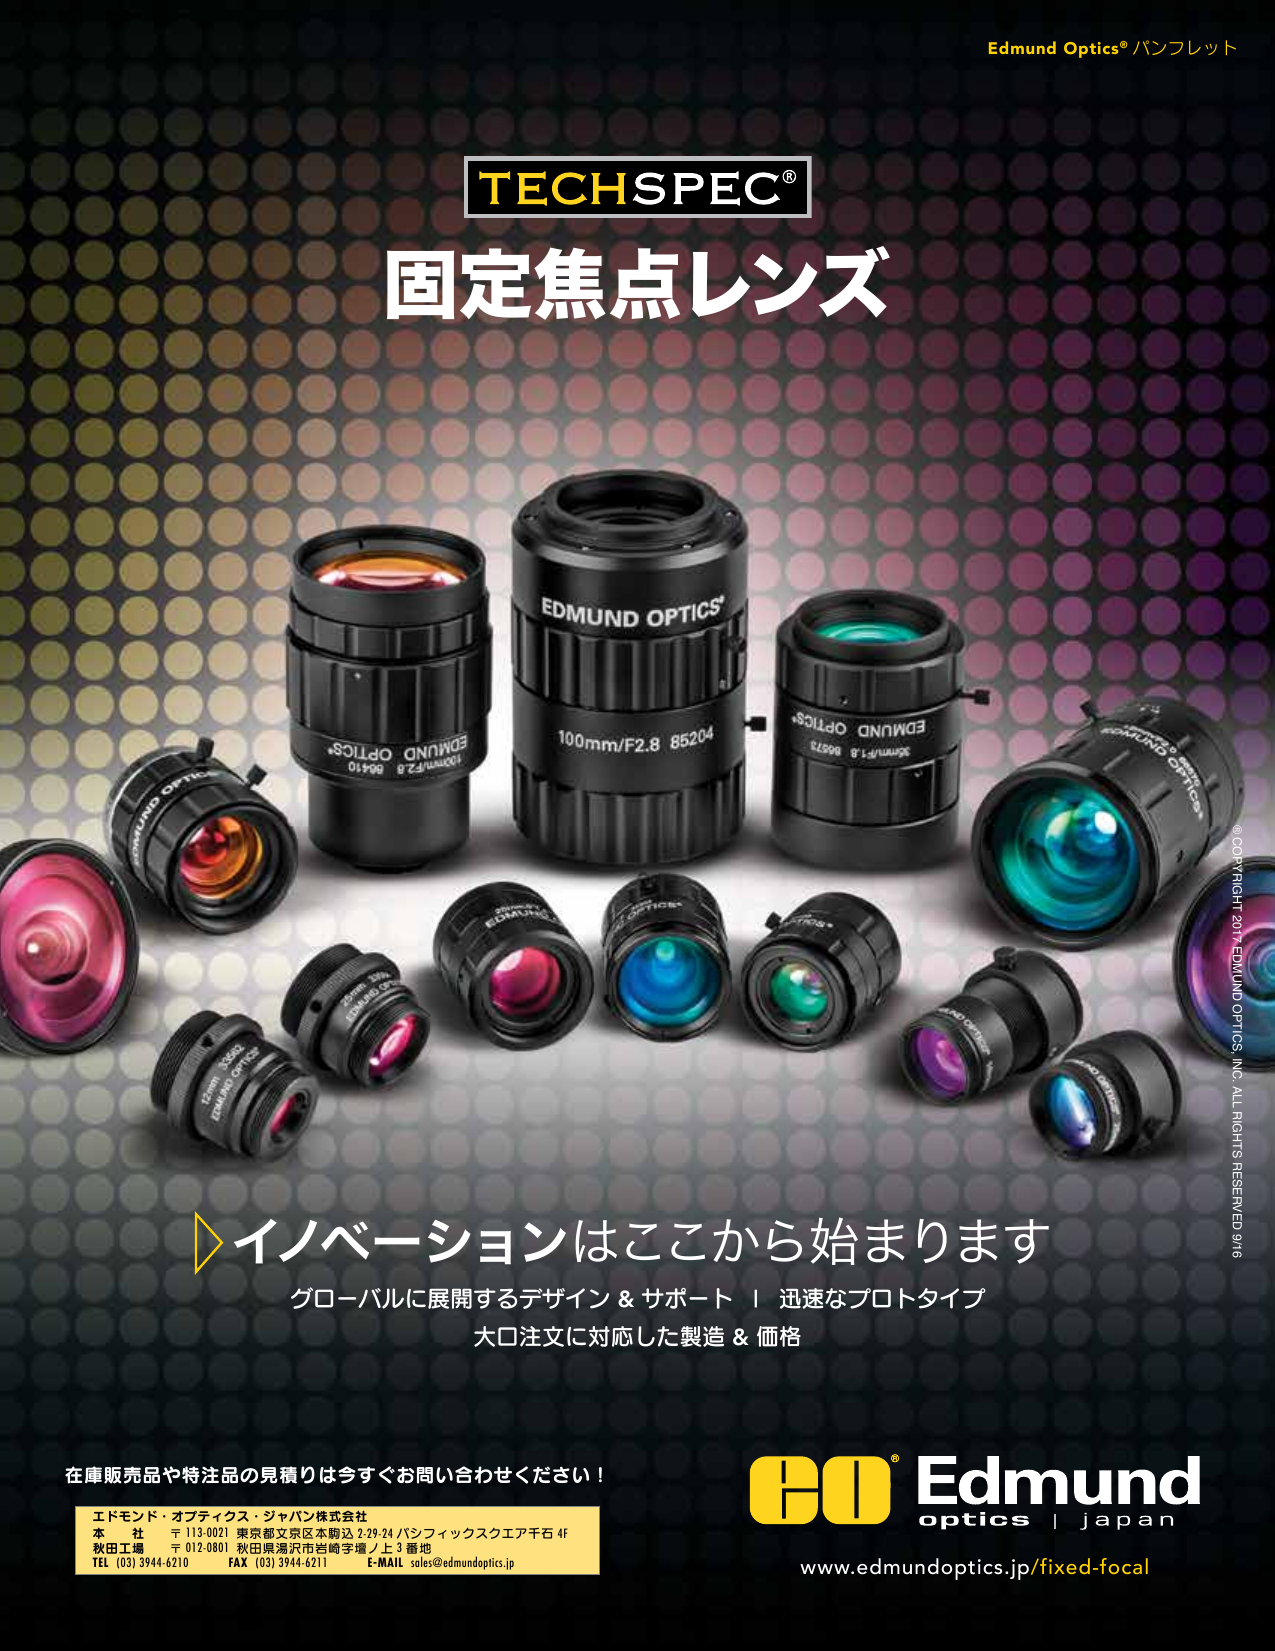 TECHSPEC® 固定焦点レンズ